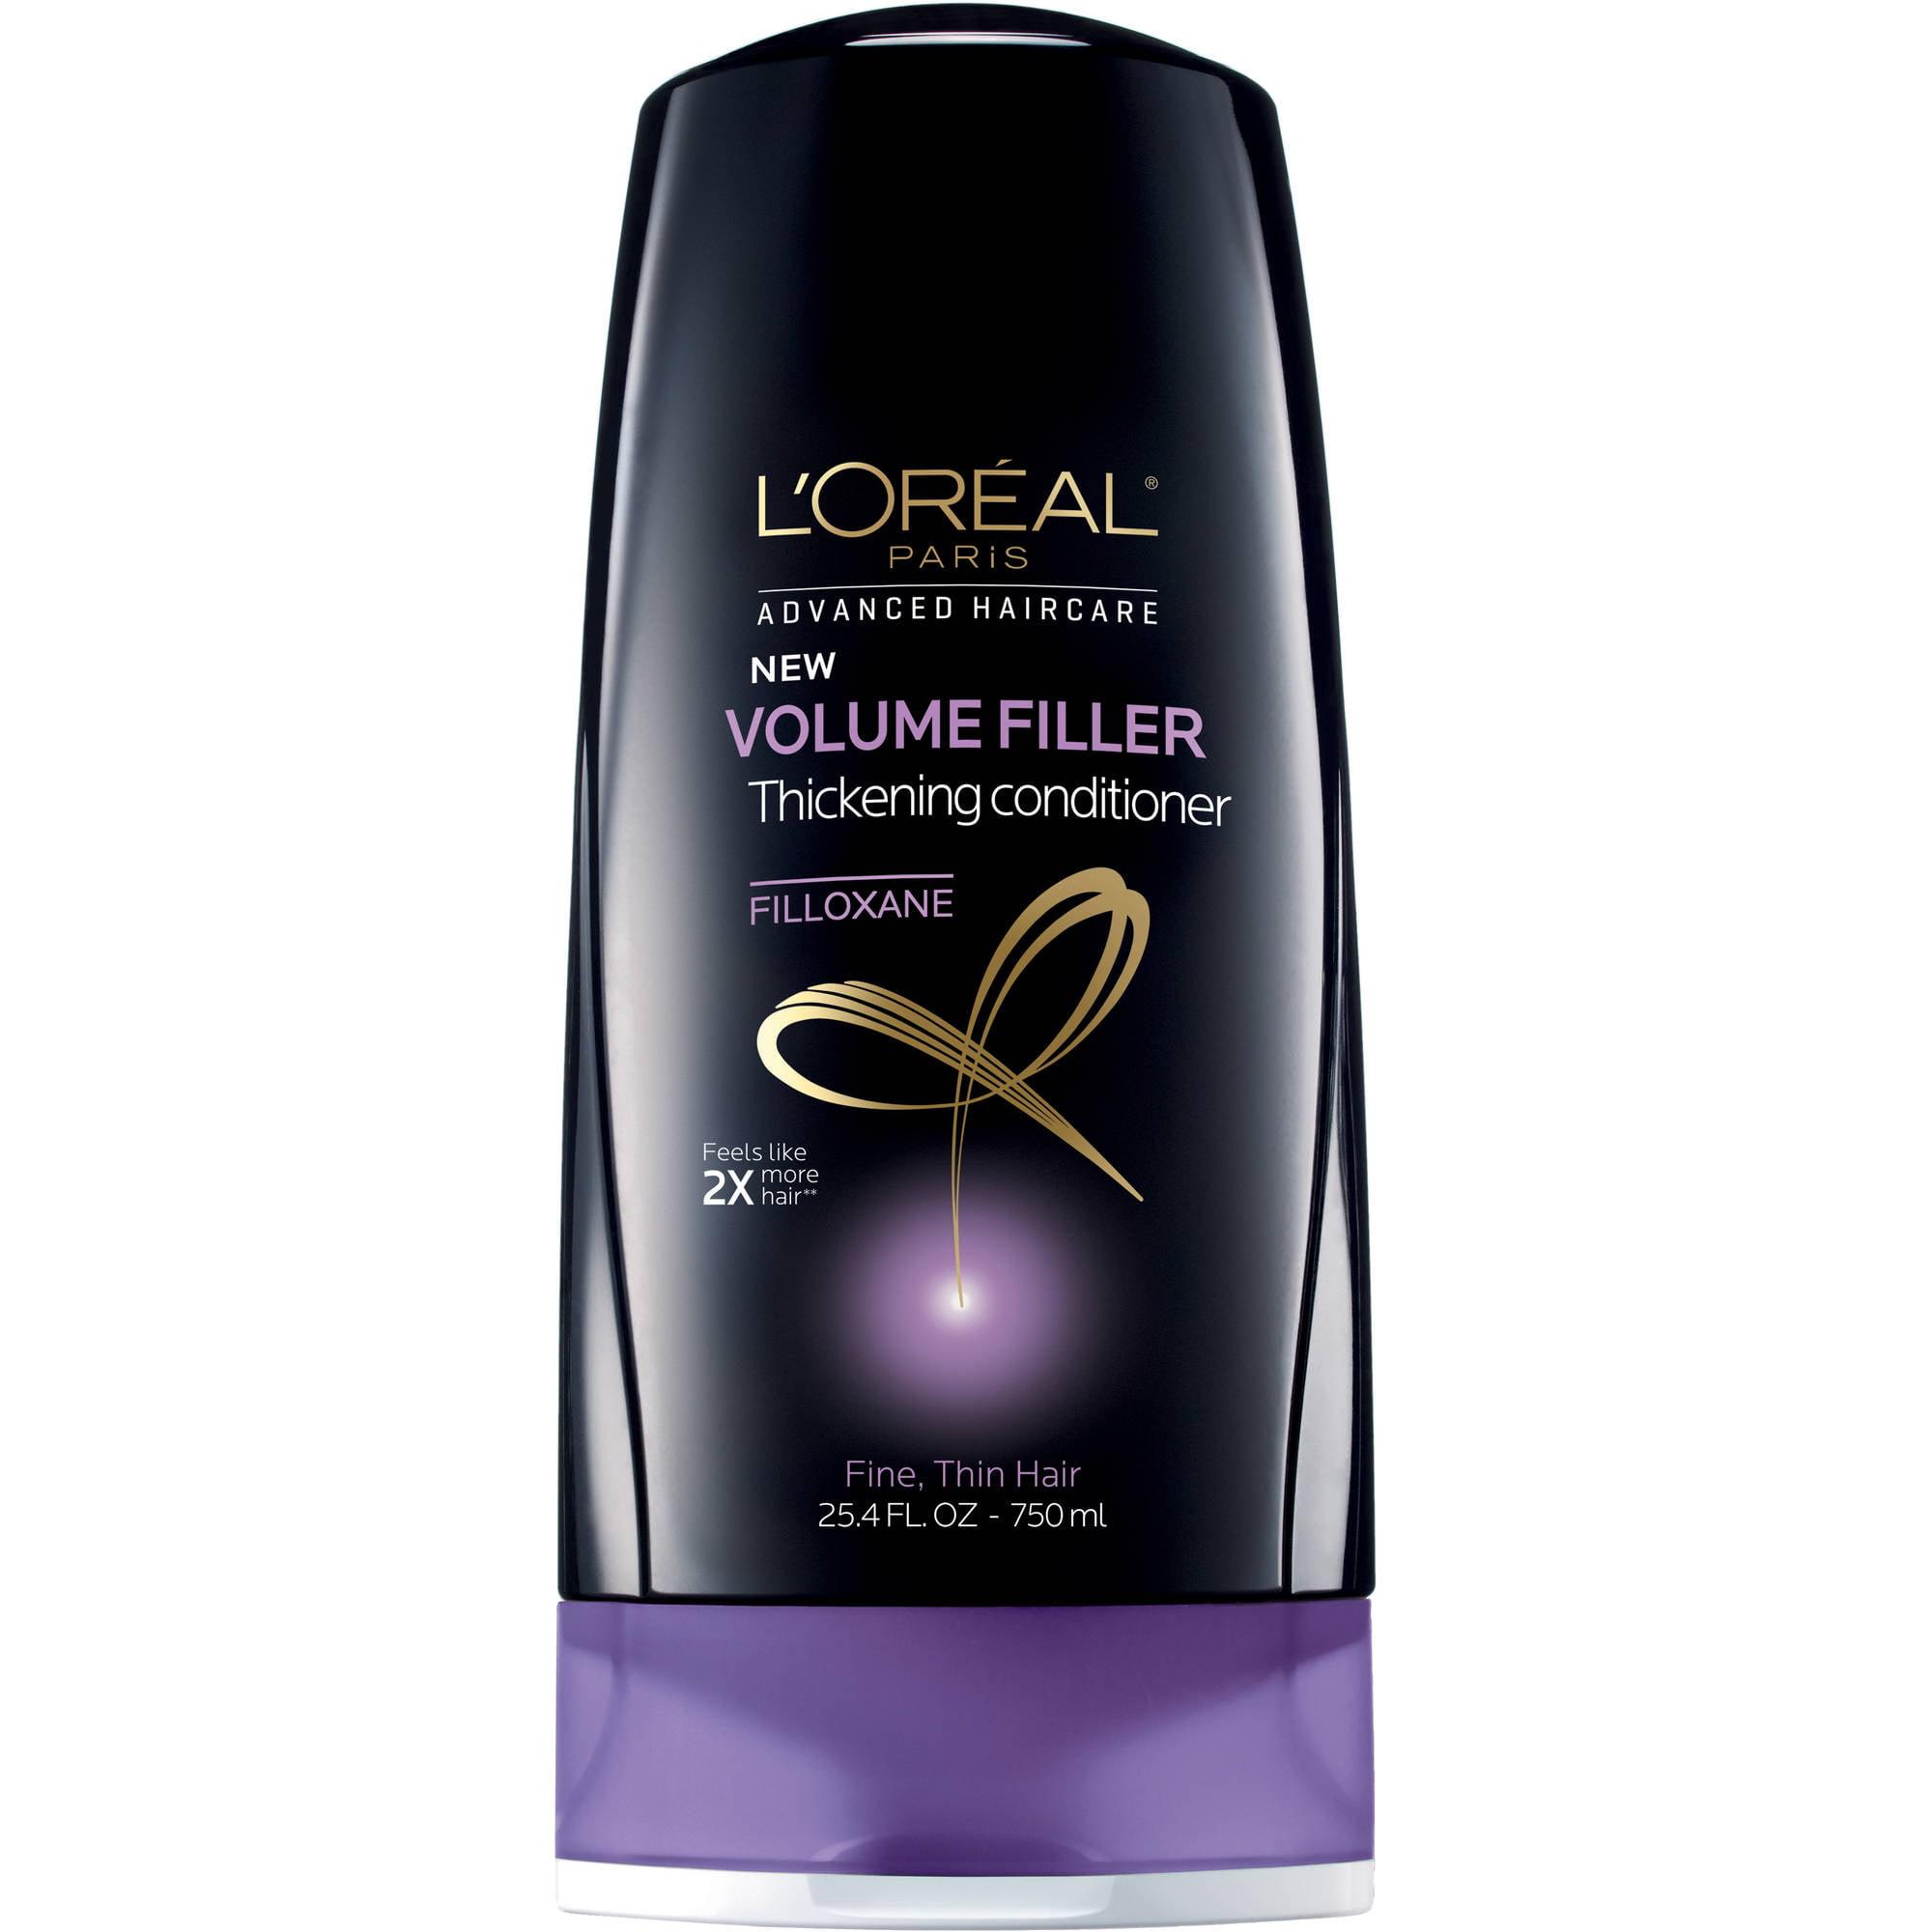 L'Oreal Paris Advanced Haircare Volume Filler Thickening Conditioner, 25.4 fl oz